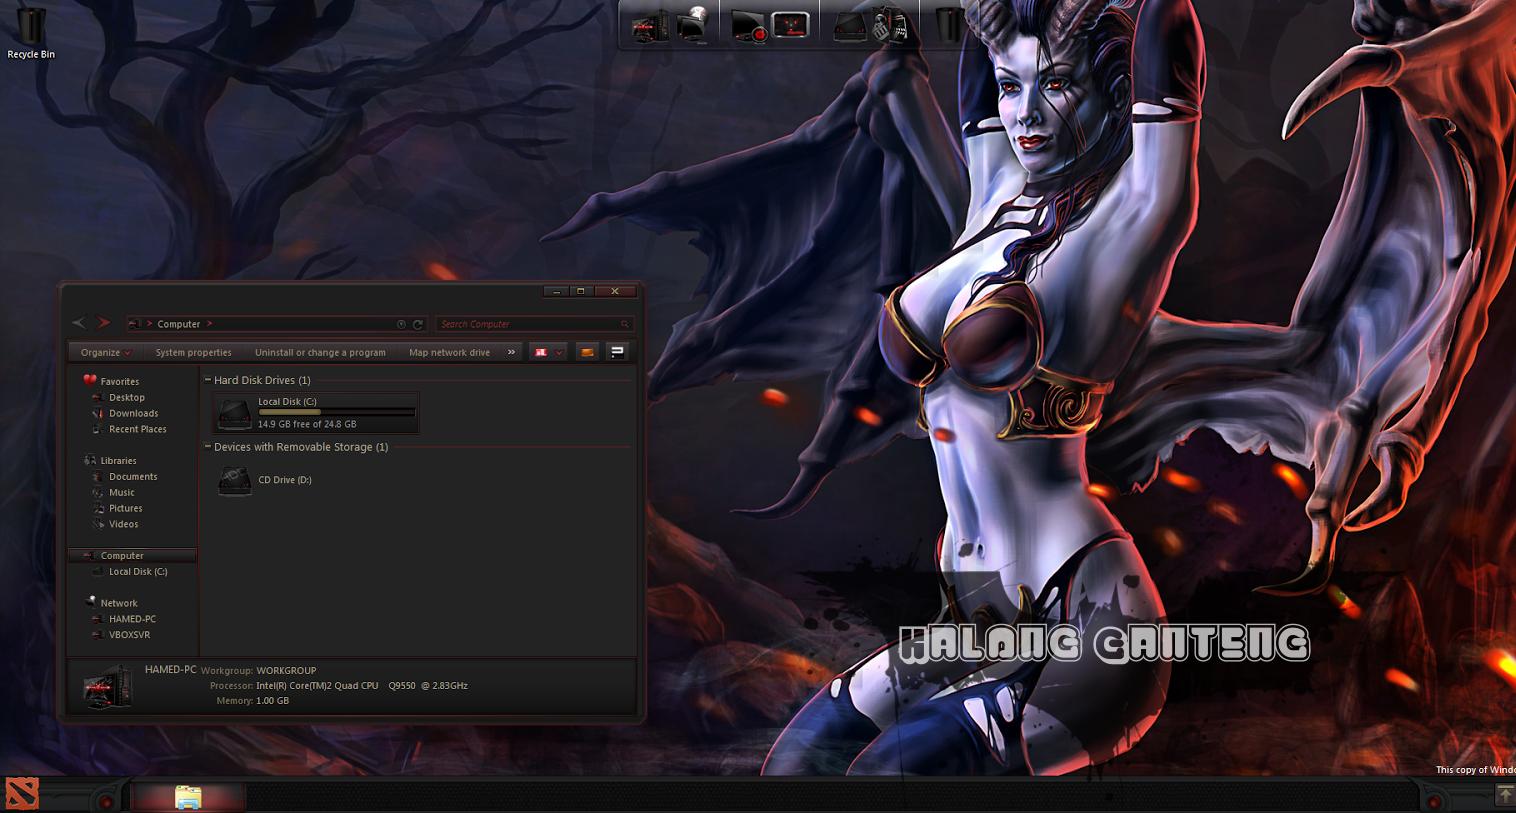 DOTA2 SkinPack Screenshot windows 7